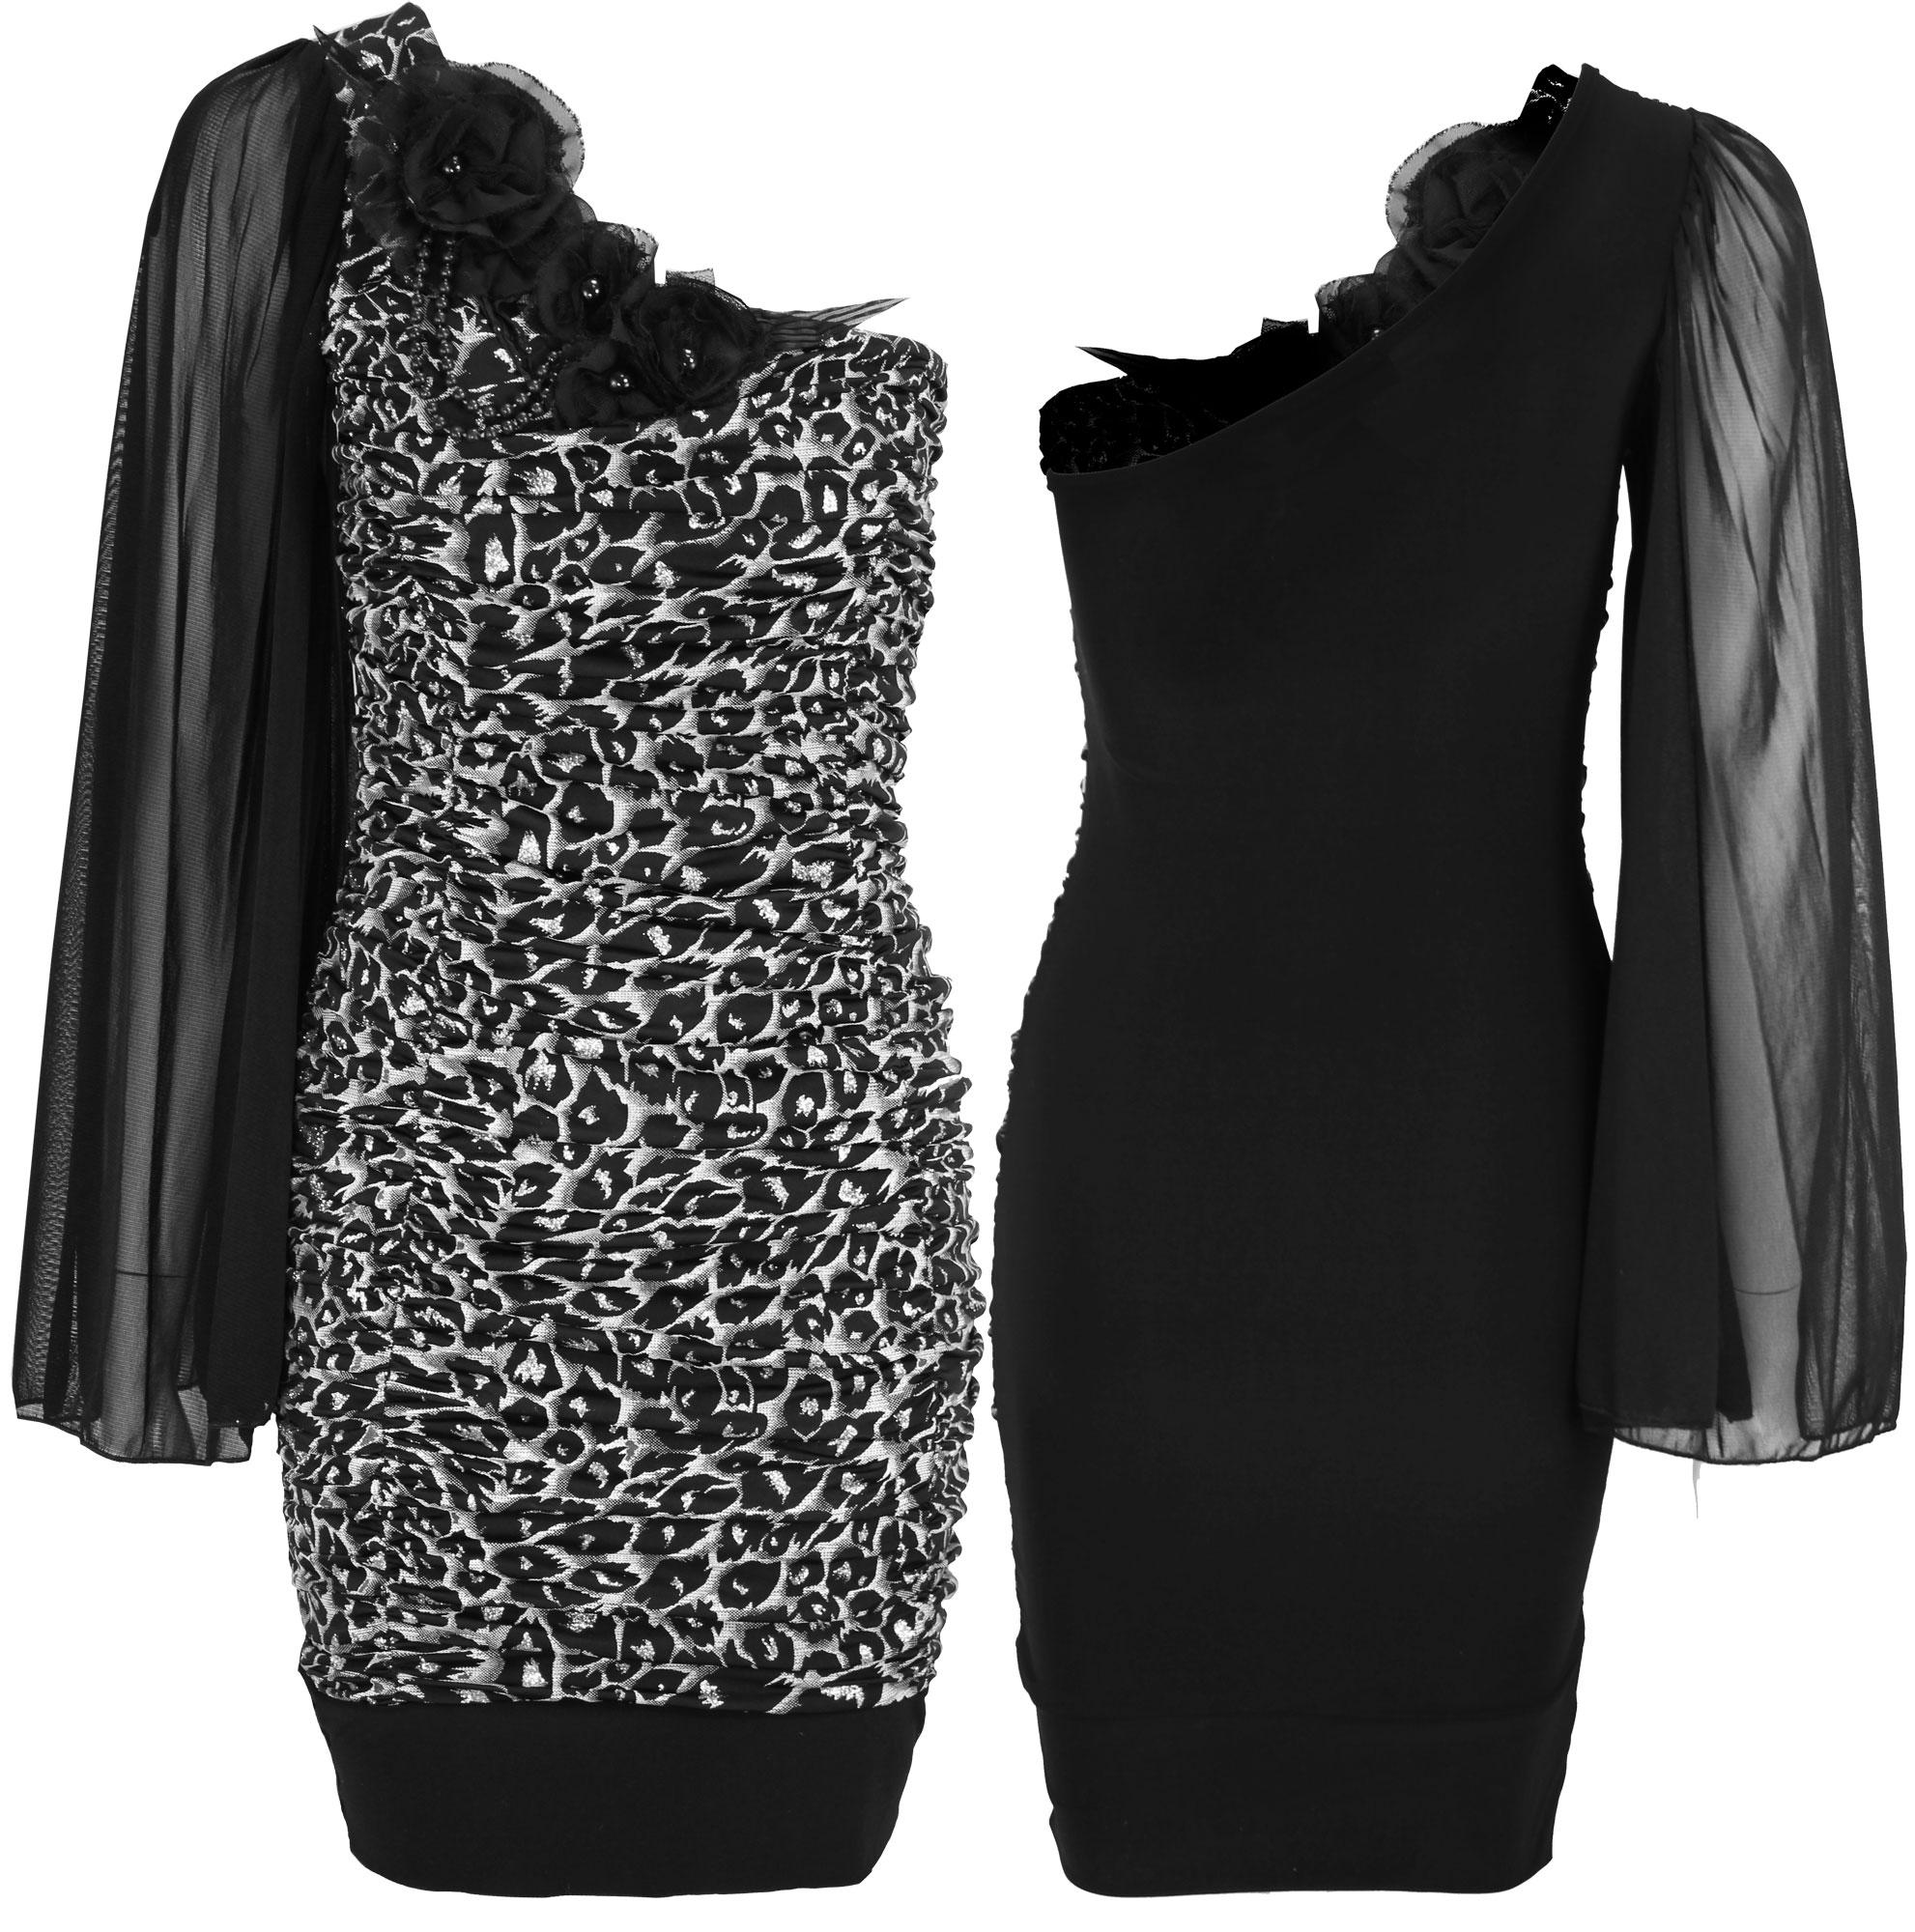 WOMENS ONE SHOULDER SIDE DRAPE DRESS LADIES RUCHED BODYCON | eBay